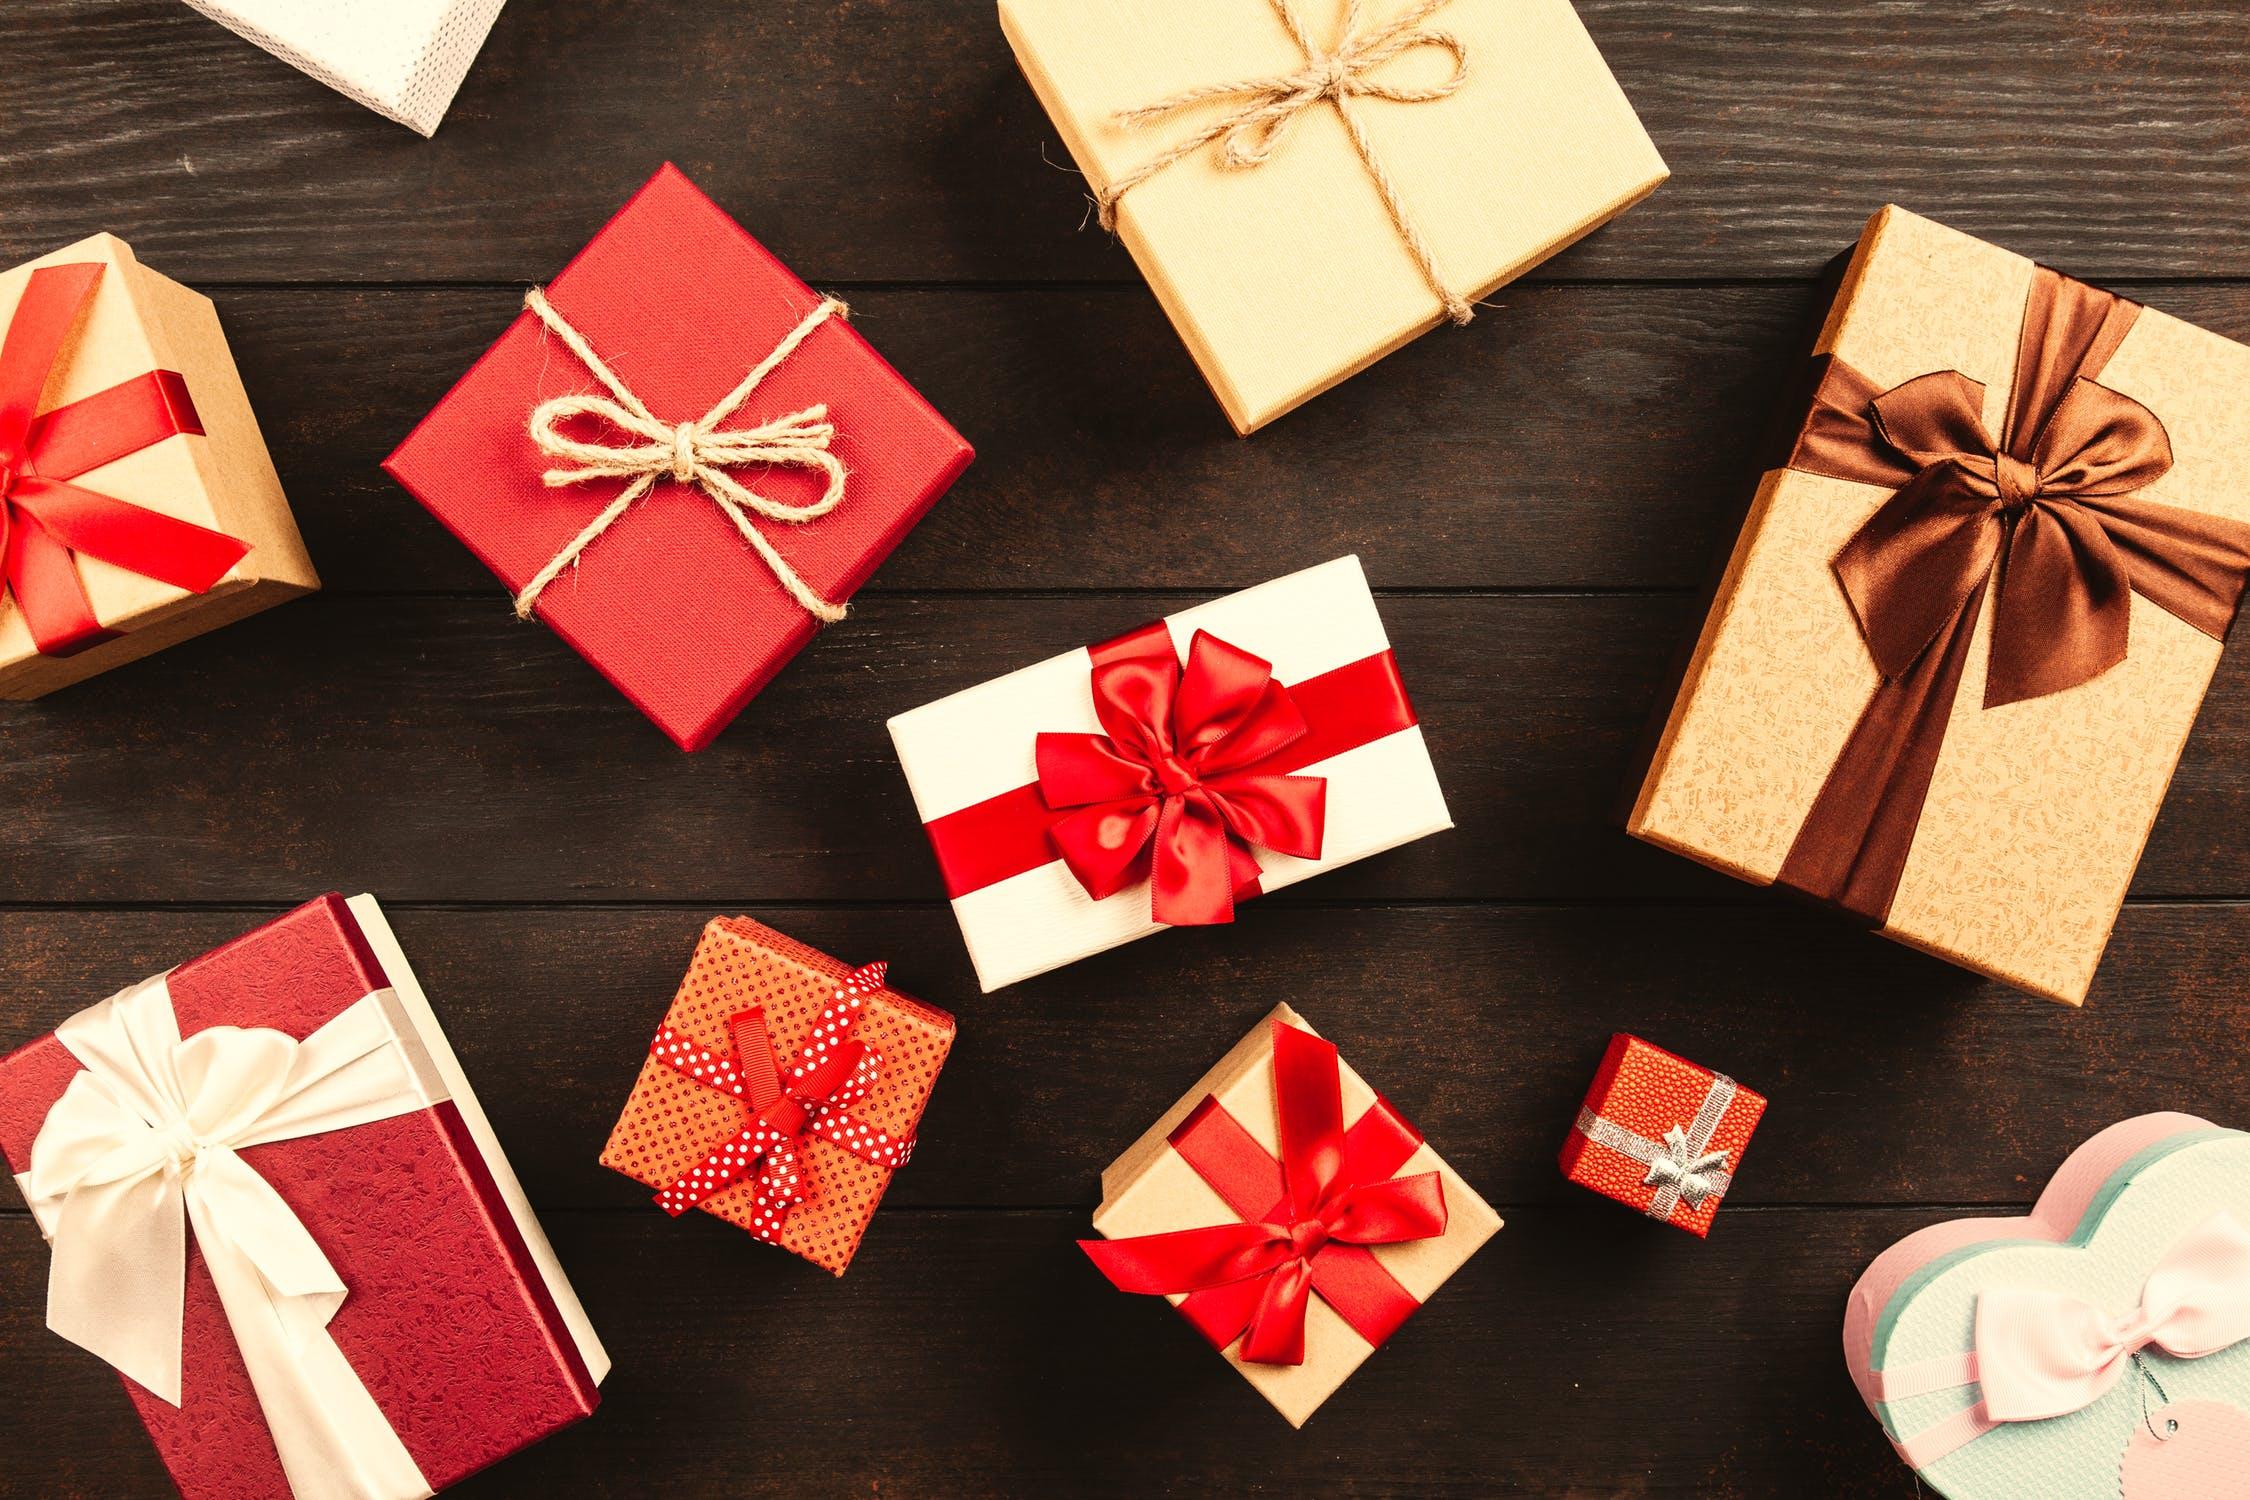 Christmas gift exchange game